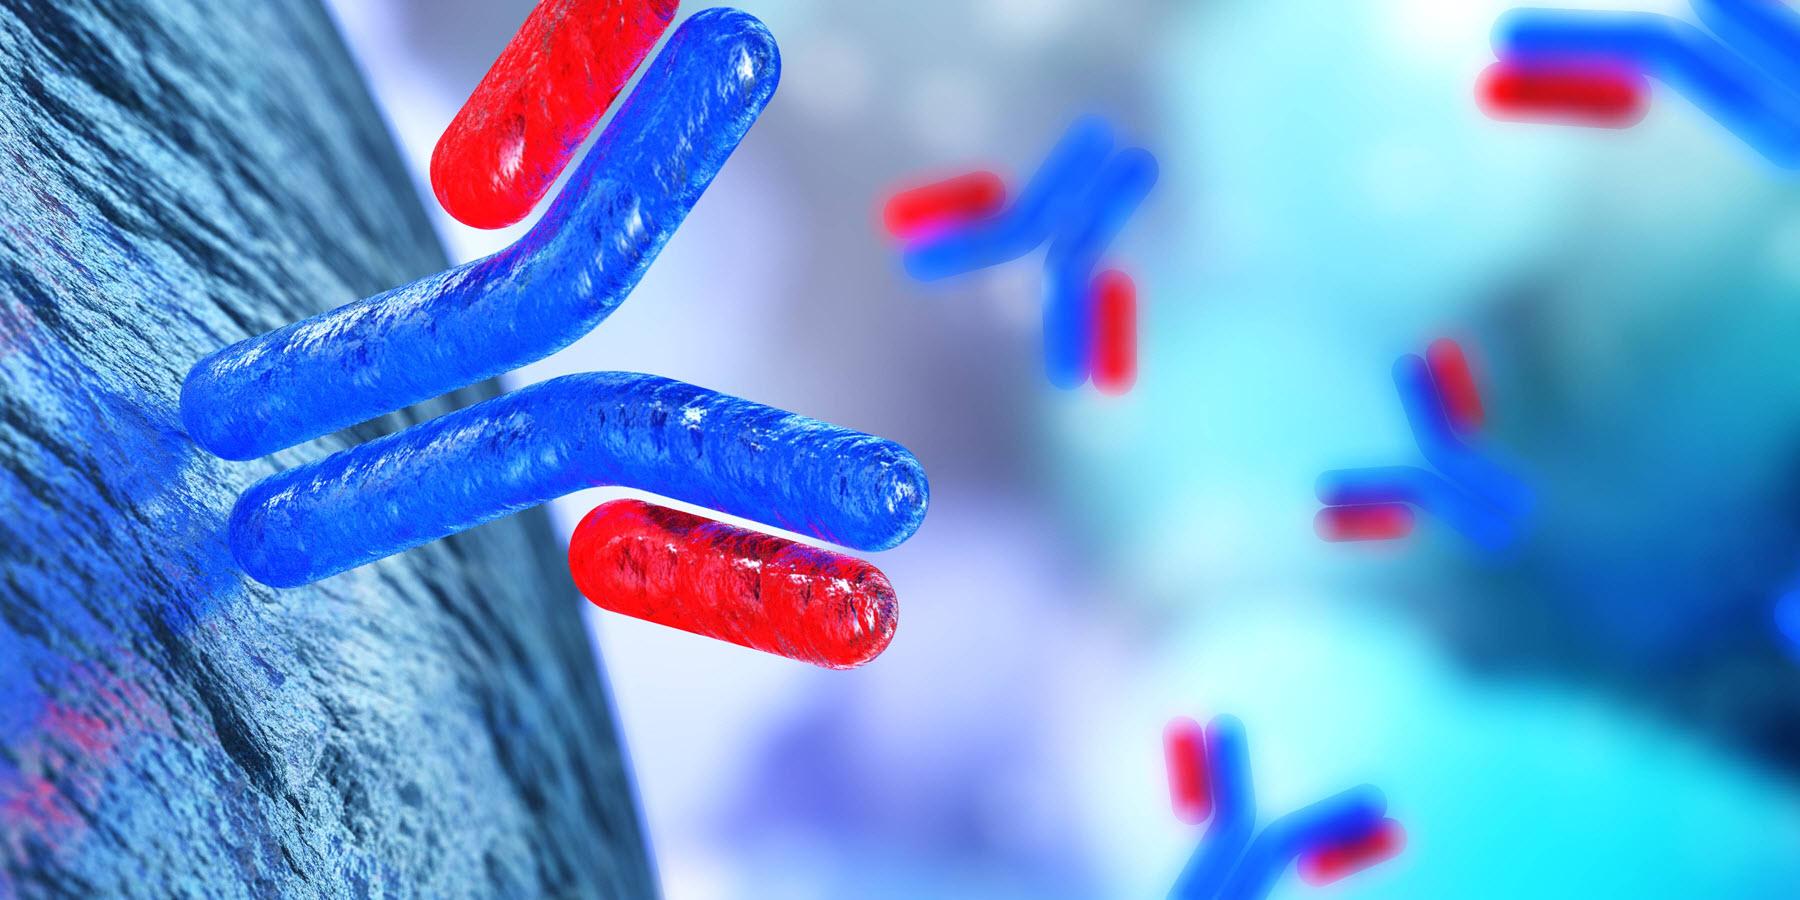 Cytosections for Antibody Screening and Immunohistochemistry Protocol Development